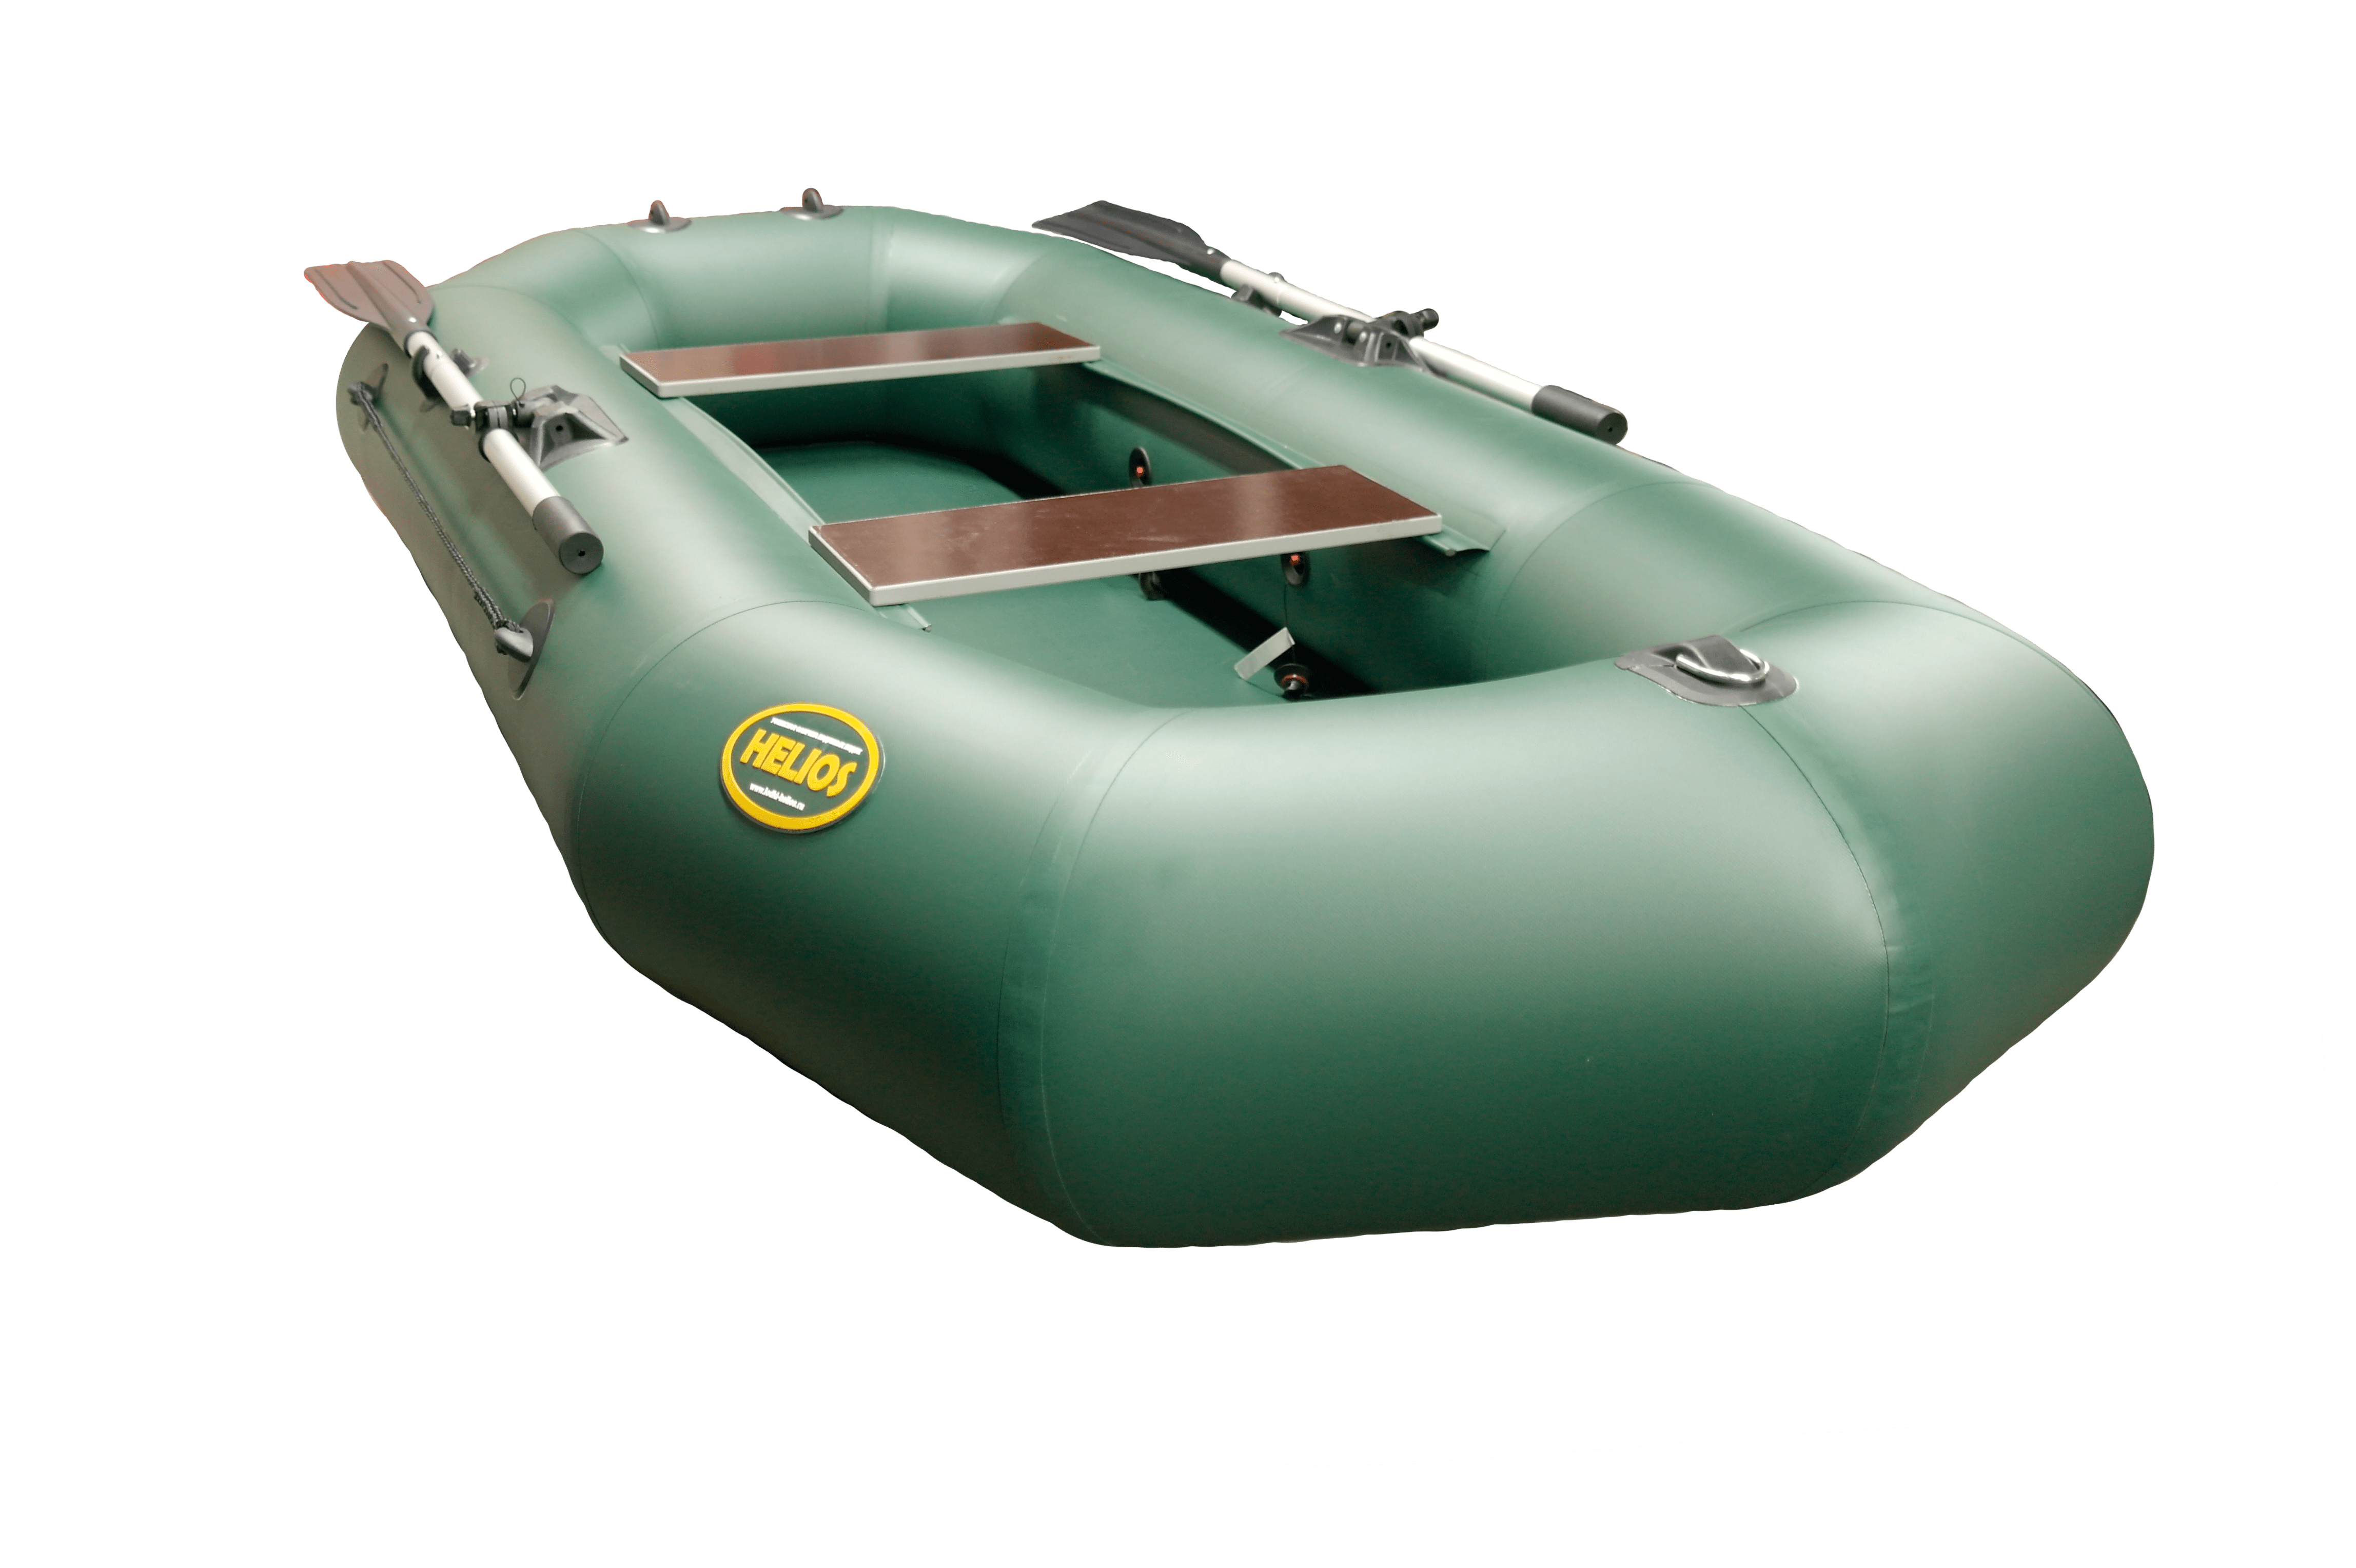 Надувная лодка Гелиос-26 (Helios)